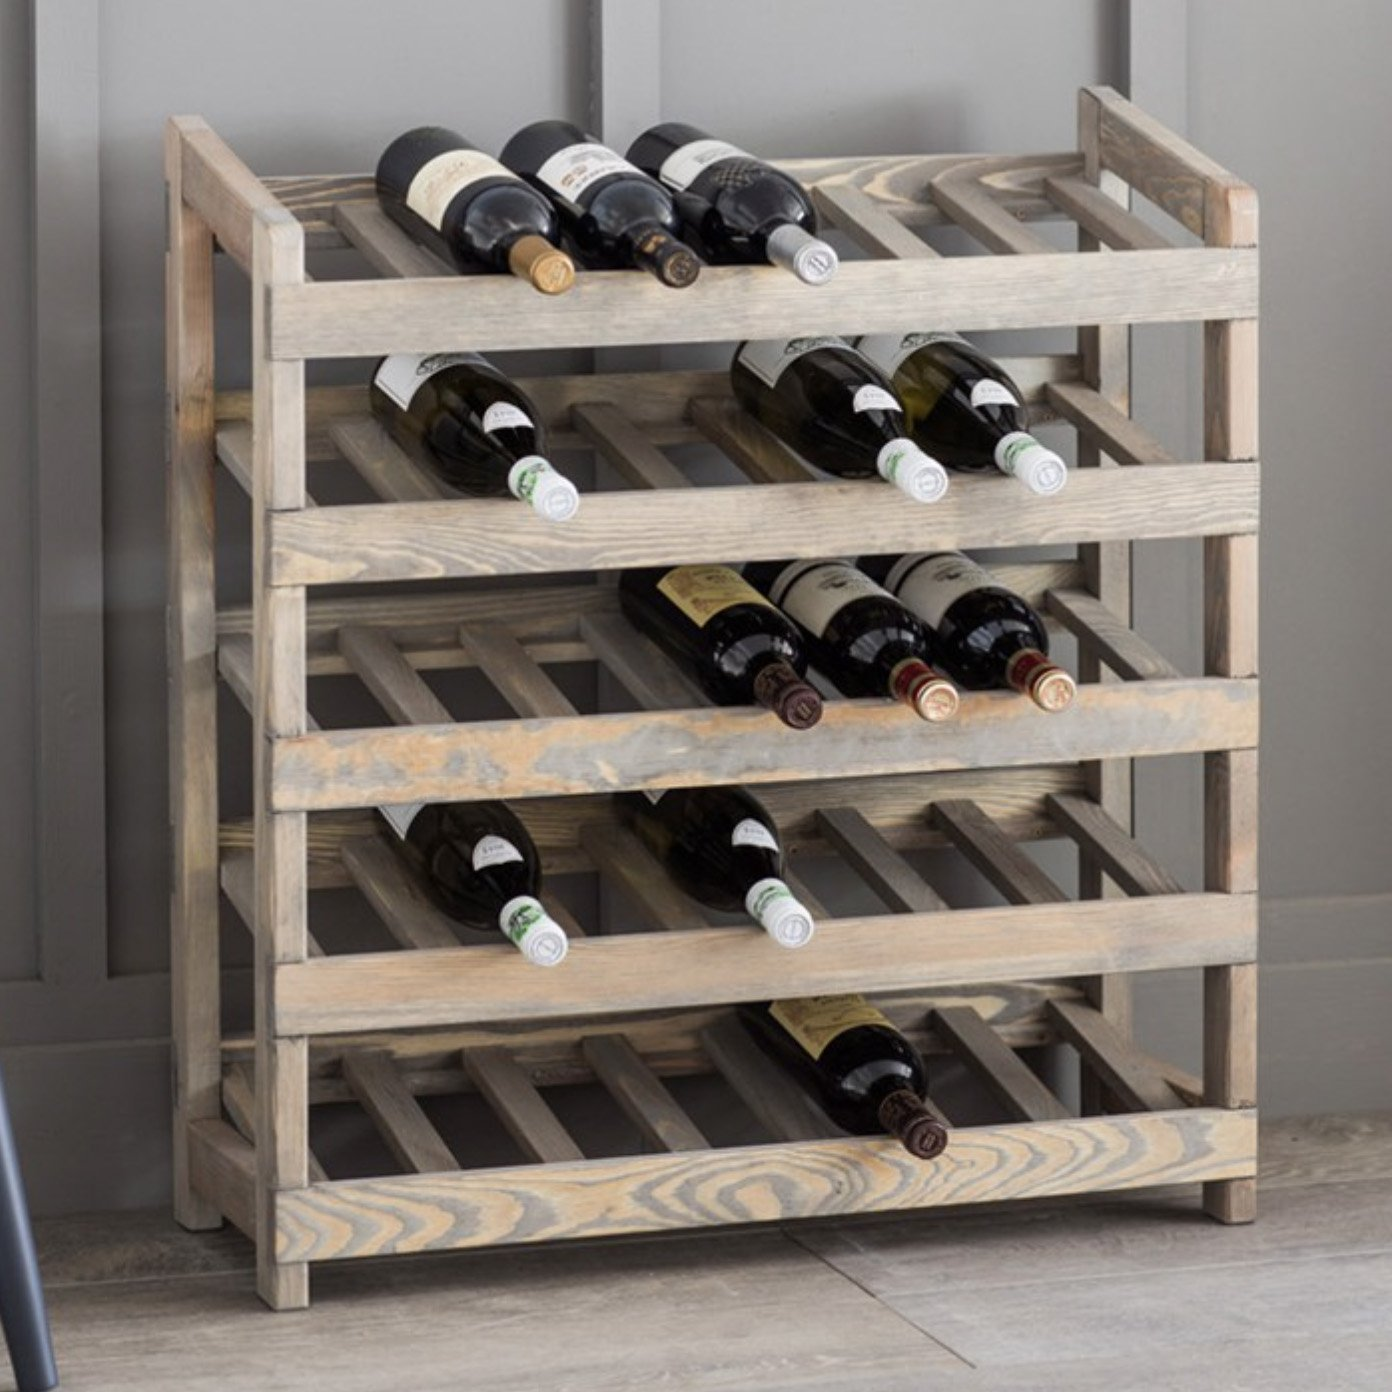 CKB Ltd Deluxe 35 Bottle Large Wine Rack Freestanding – Wood Spruce - Wooden Wine Bottle Storage Rack Holder For Bar Home Kitchen